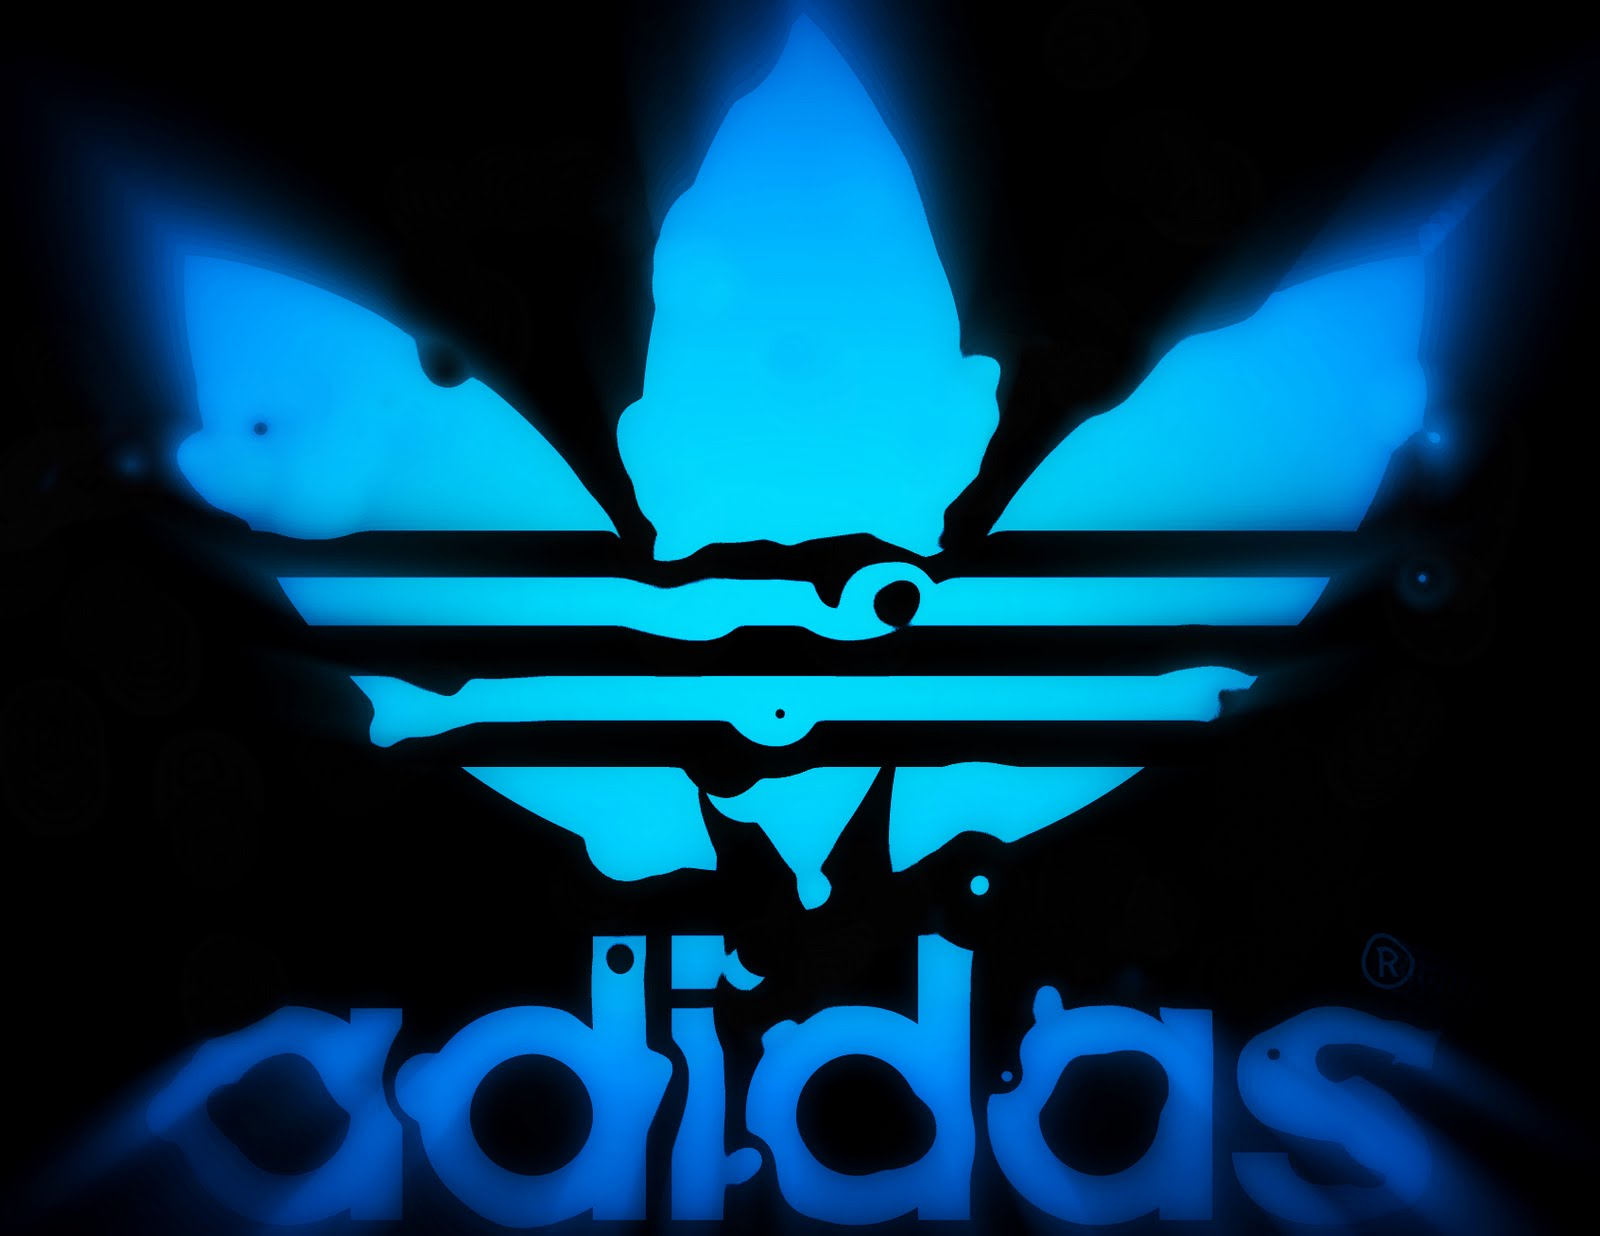 Black Adidas Shirt Template Roblox - Nils Stucki Kieferorthopäde